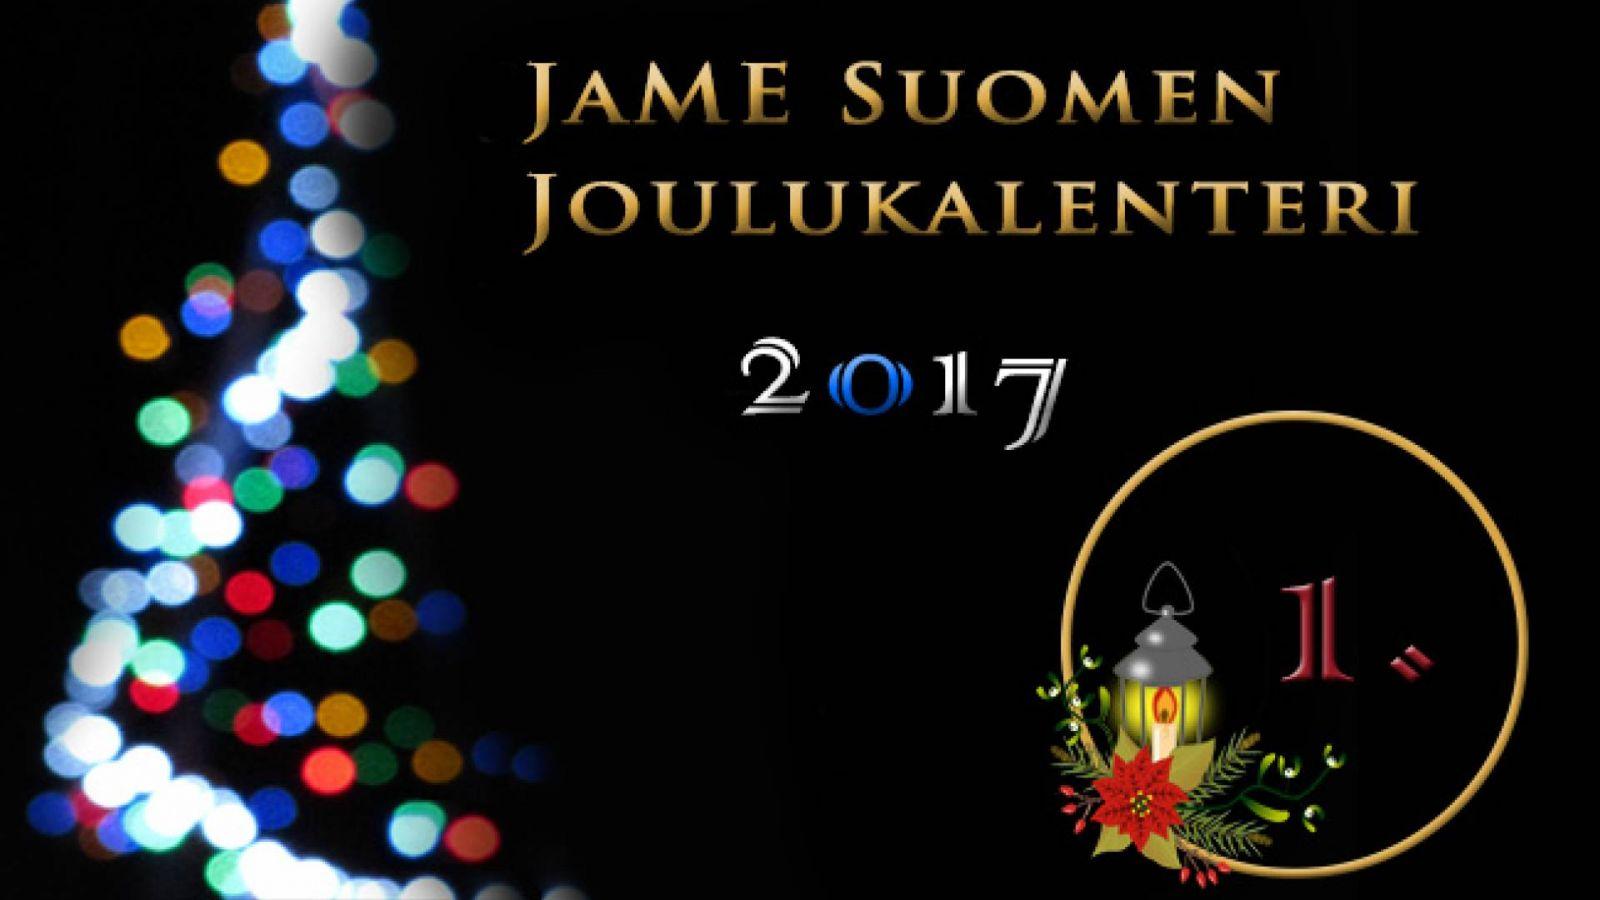 JaME Suomen joulukalenterin 1. luukku © Nipsu